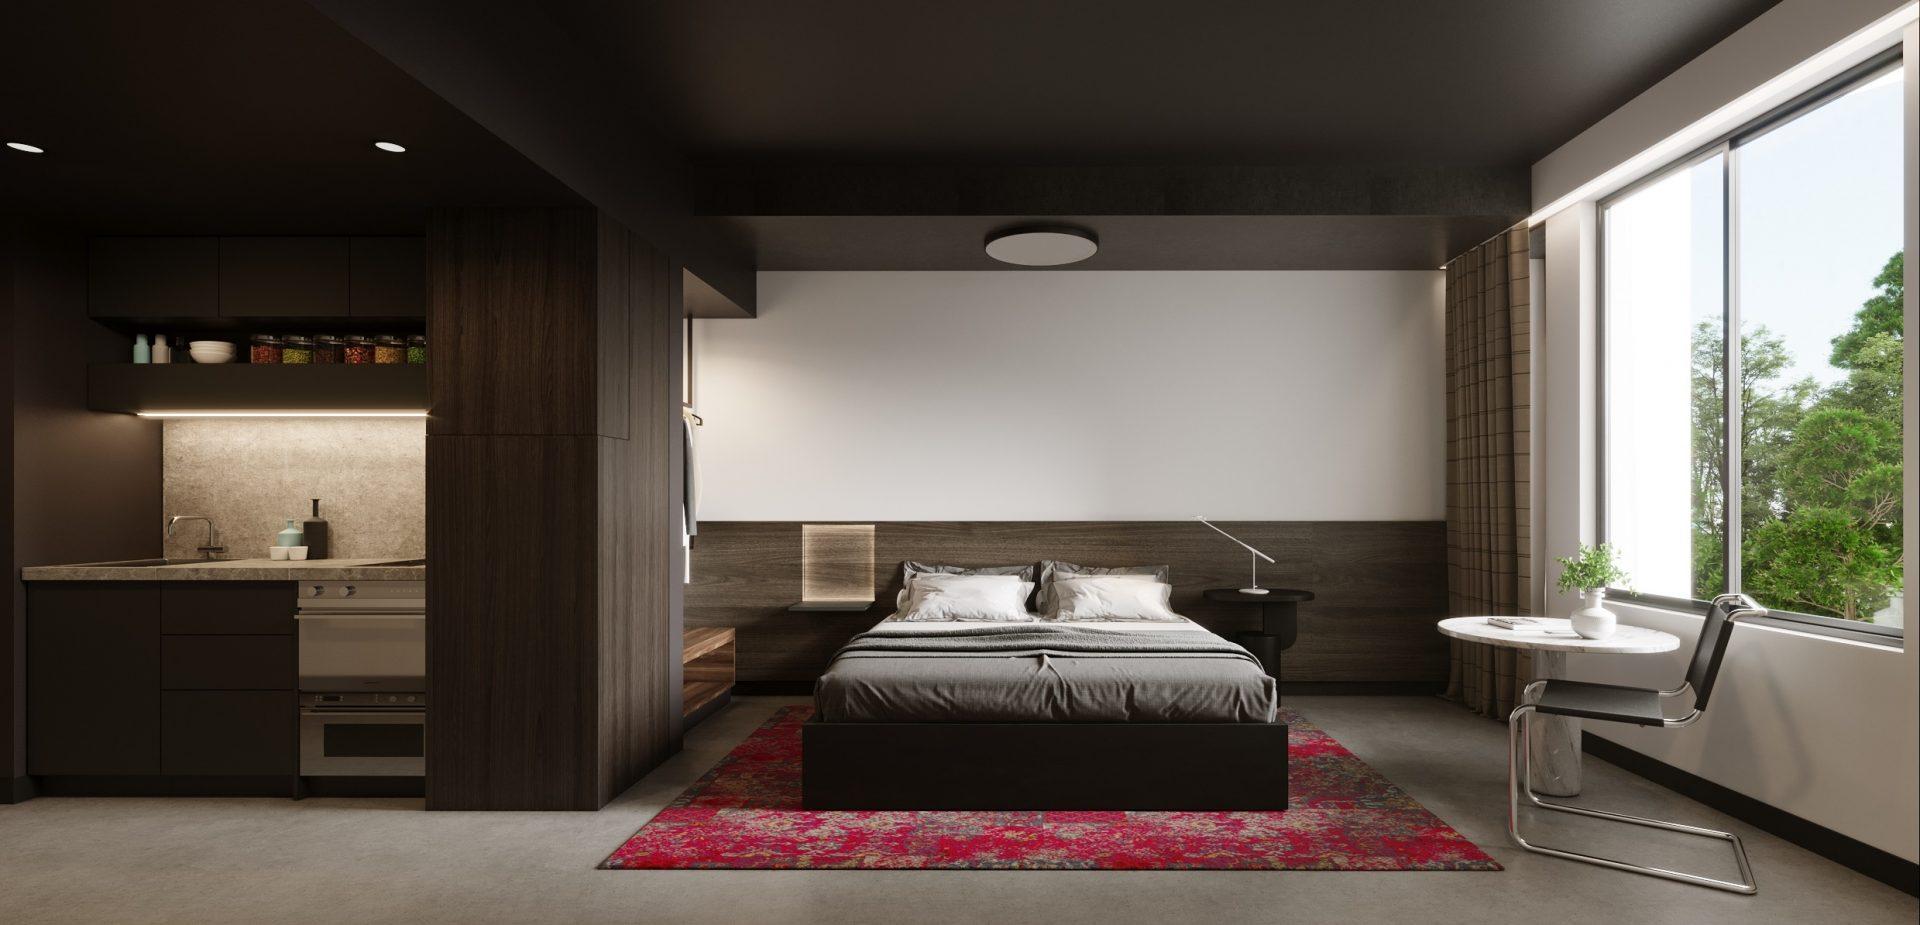 Mia Hotel Bedroom